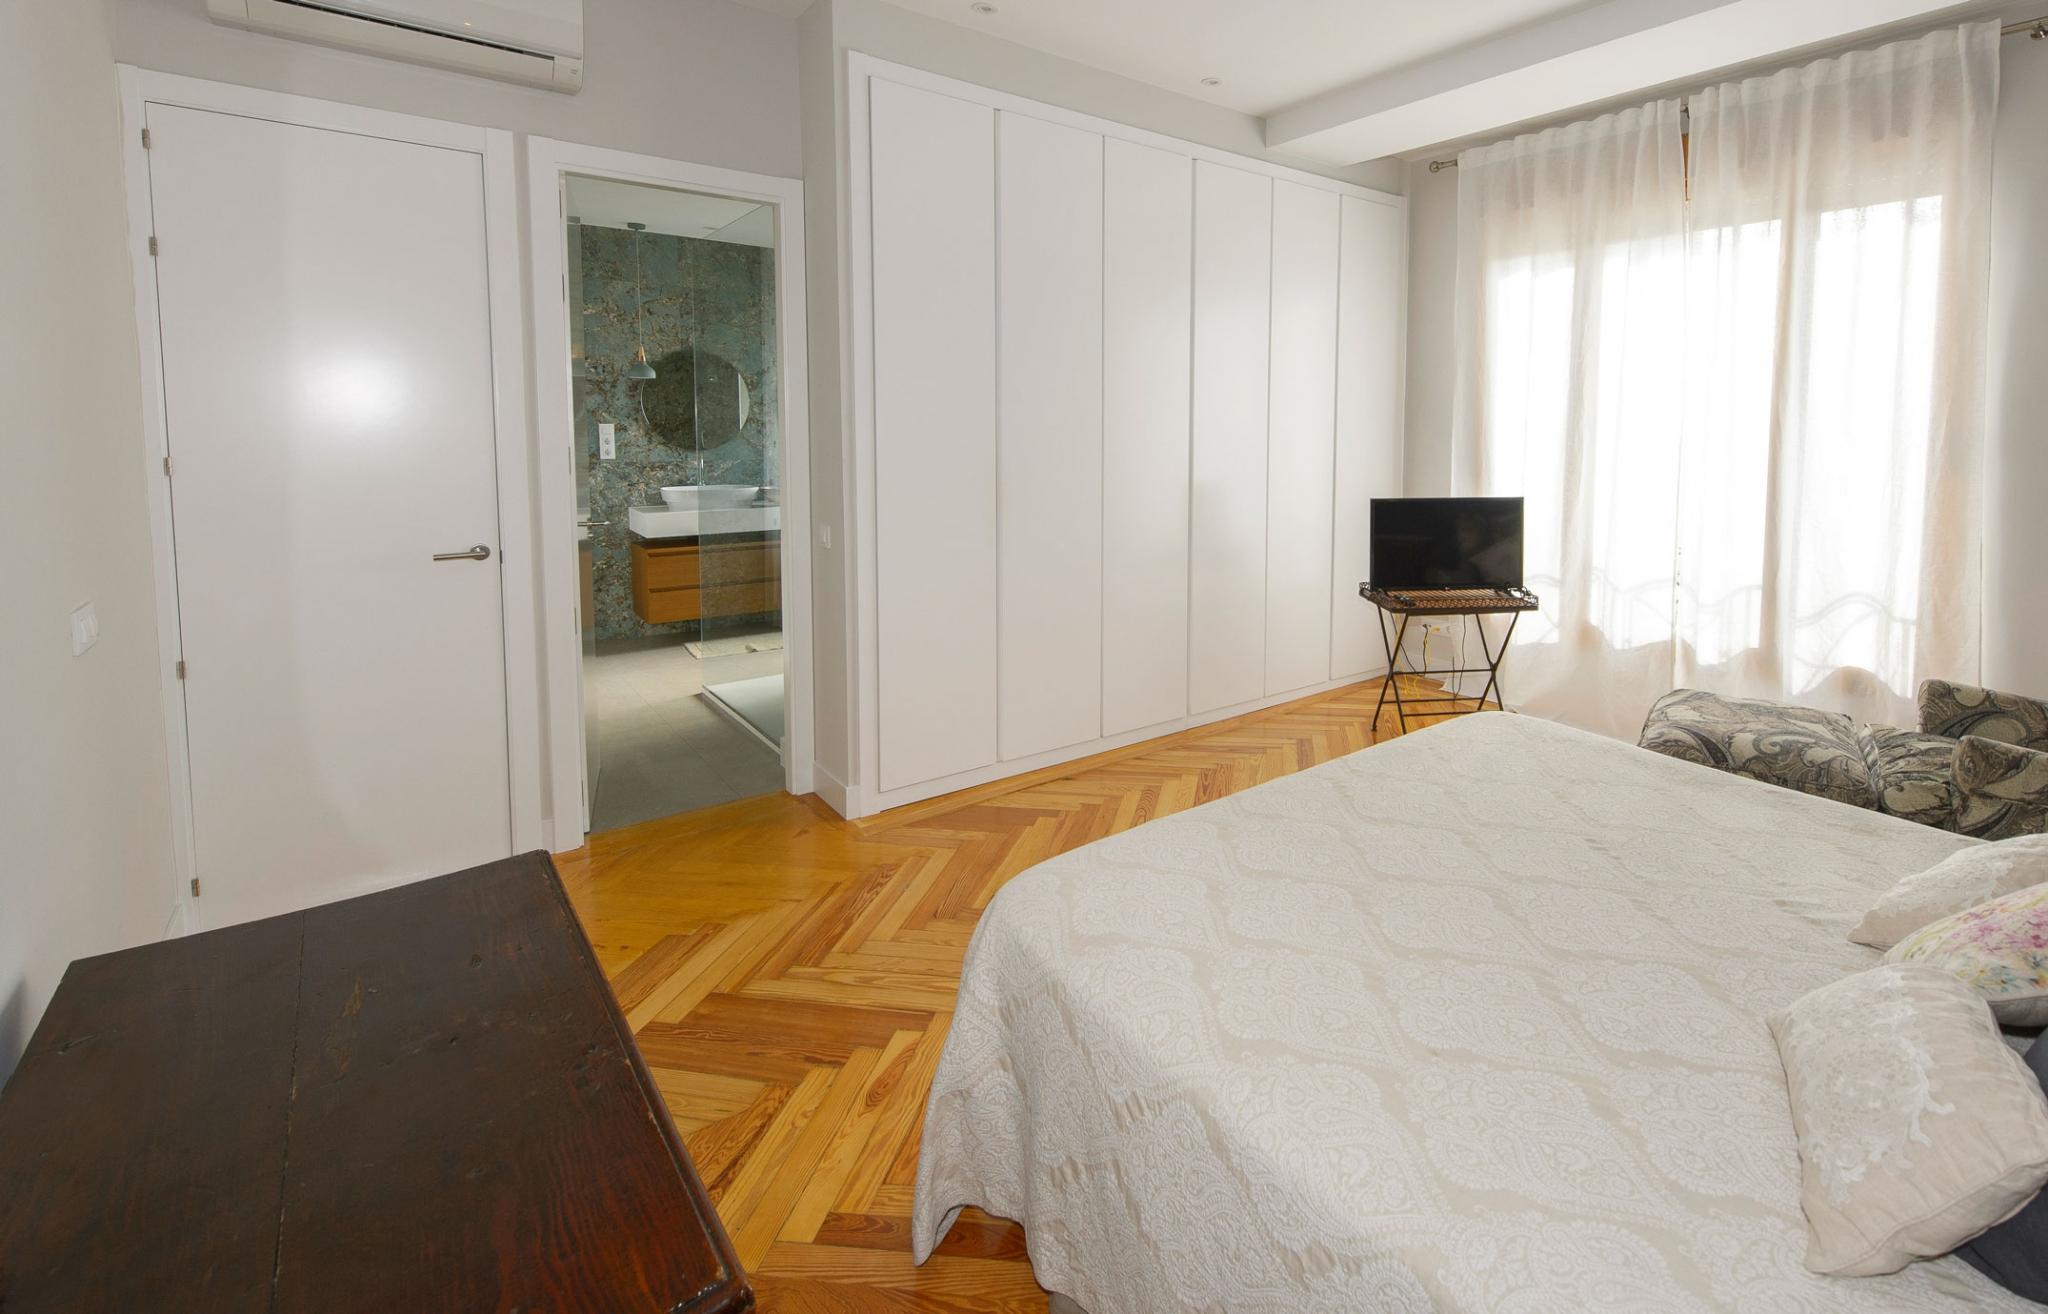 Dormitorio con baño en calle Velázquez